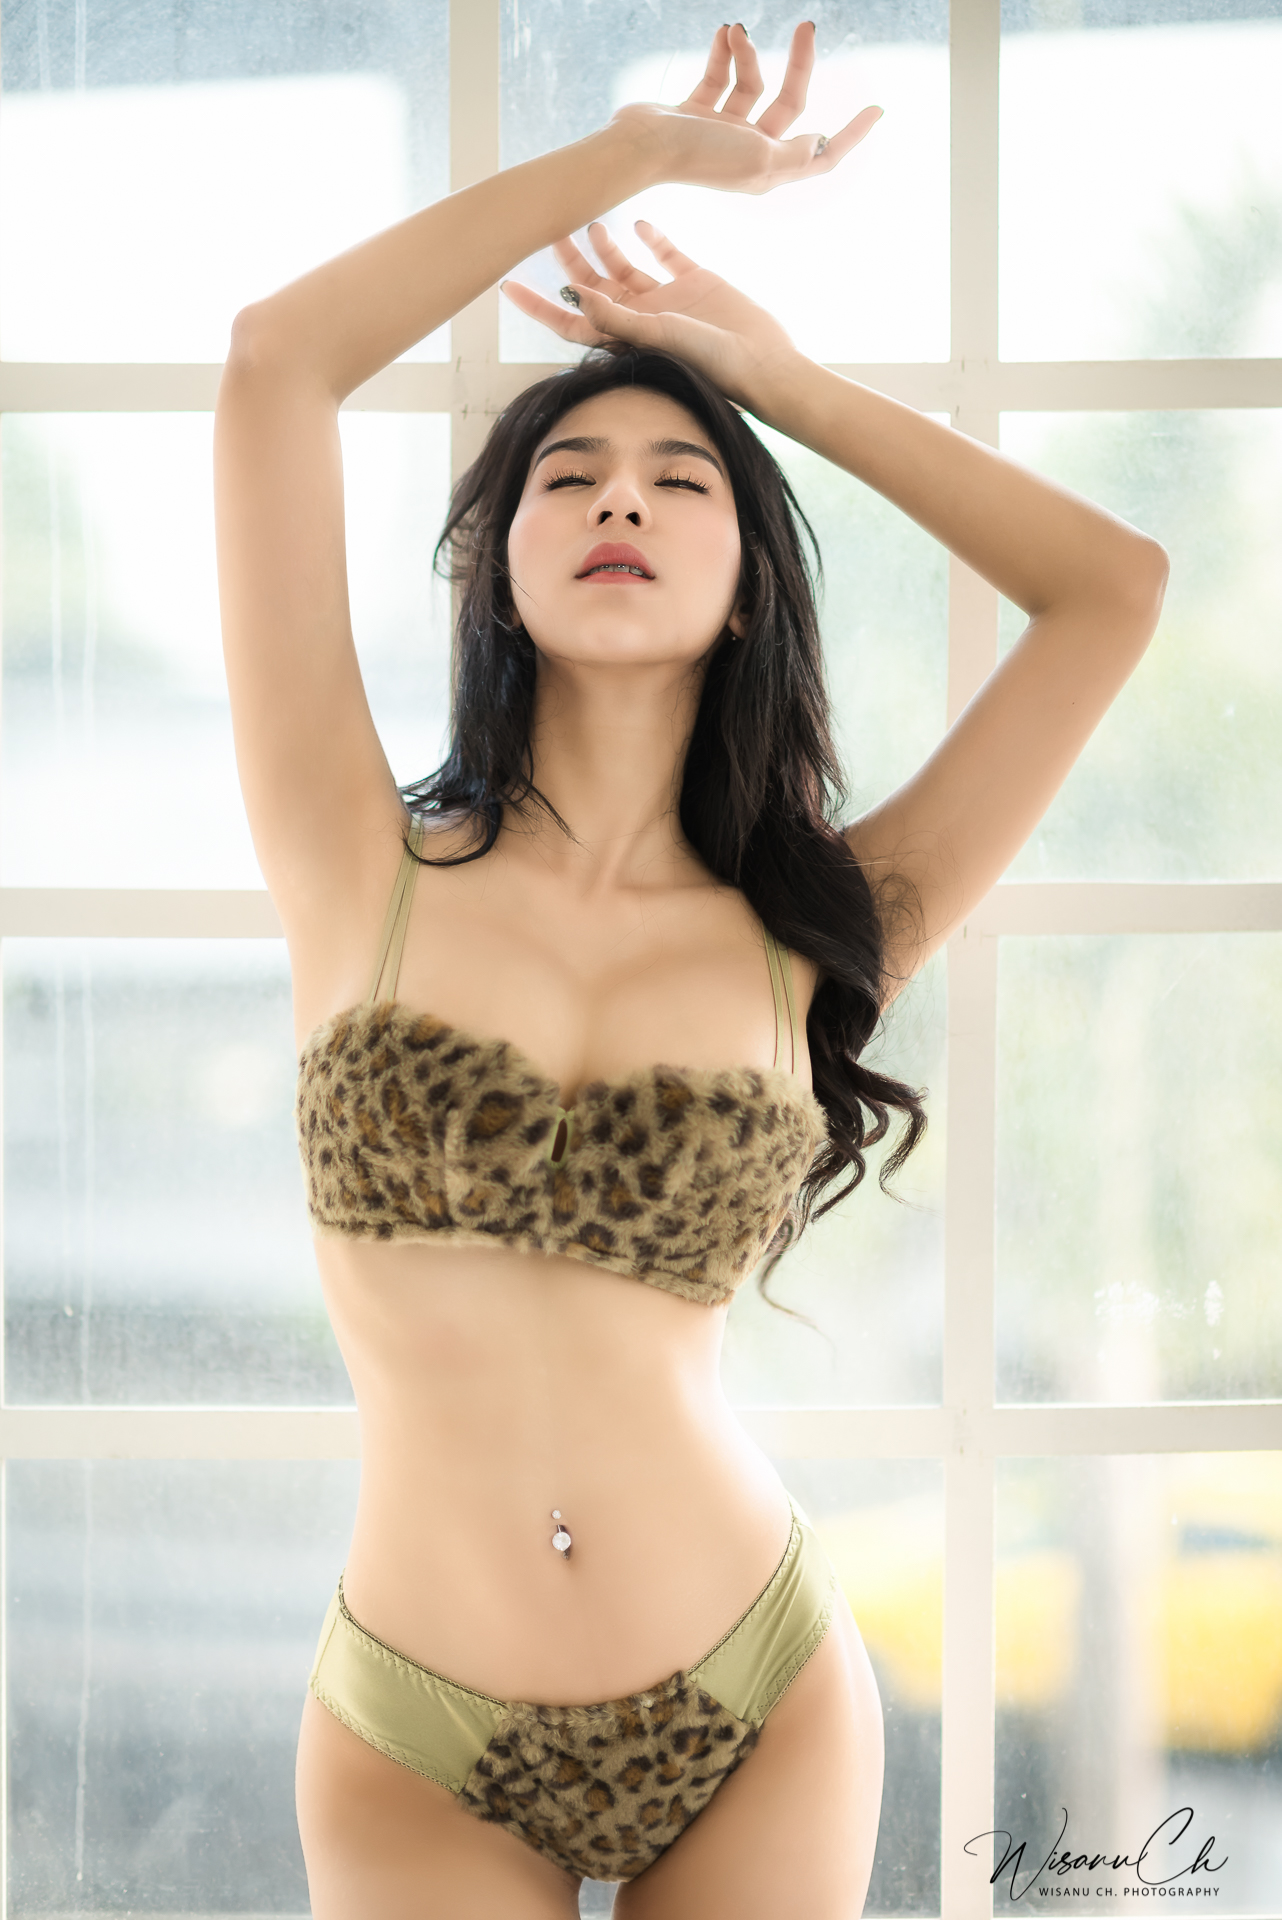 Sweet Lemon - Jeerachat Yamsang